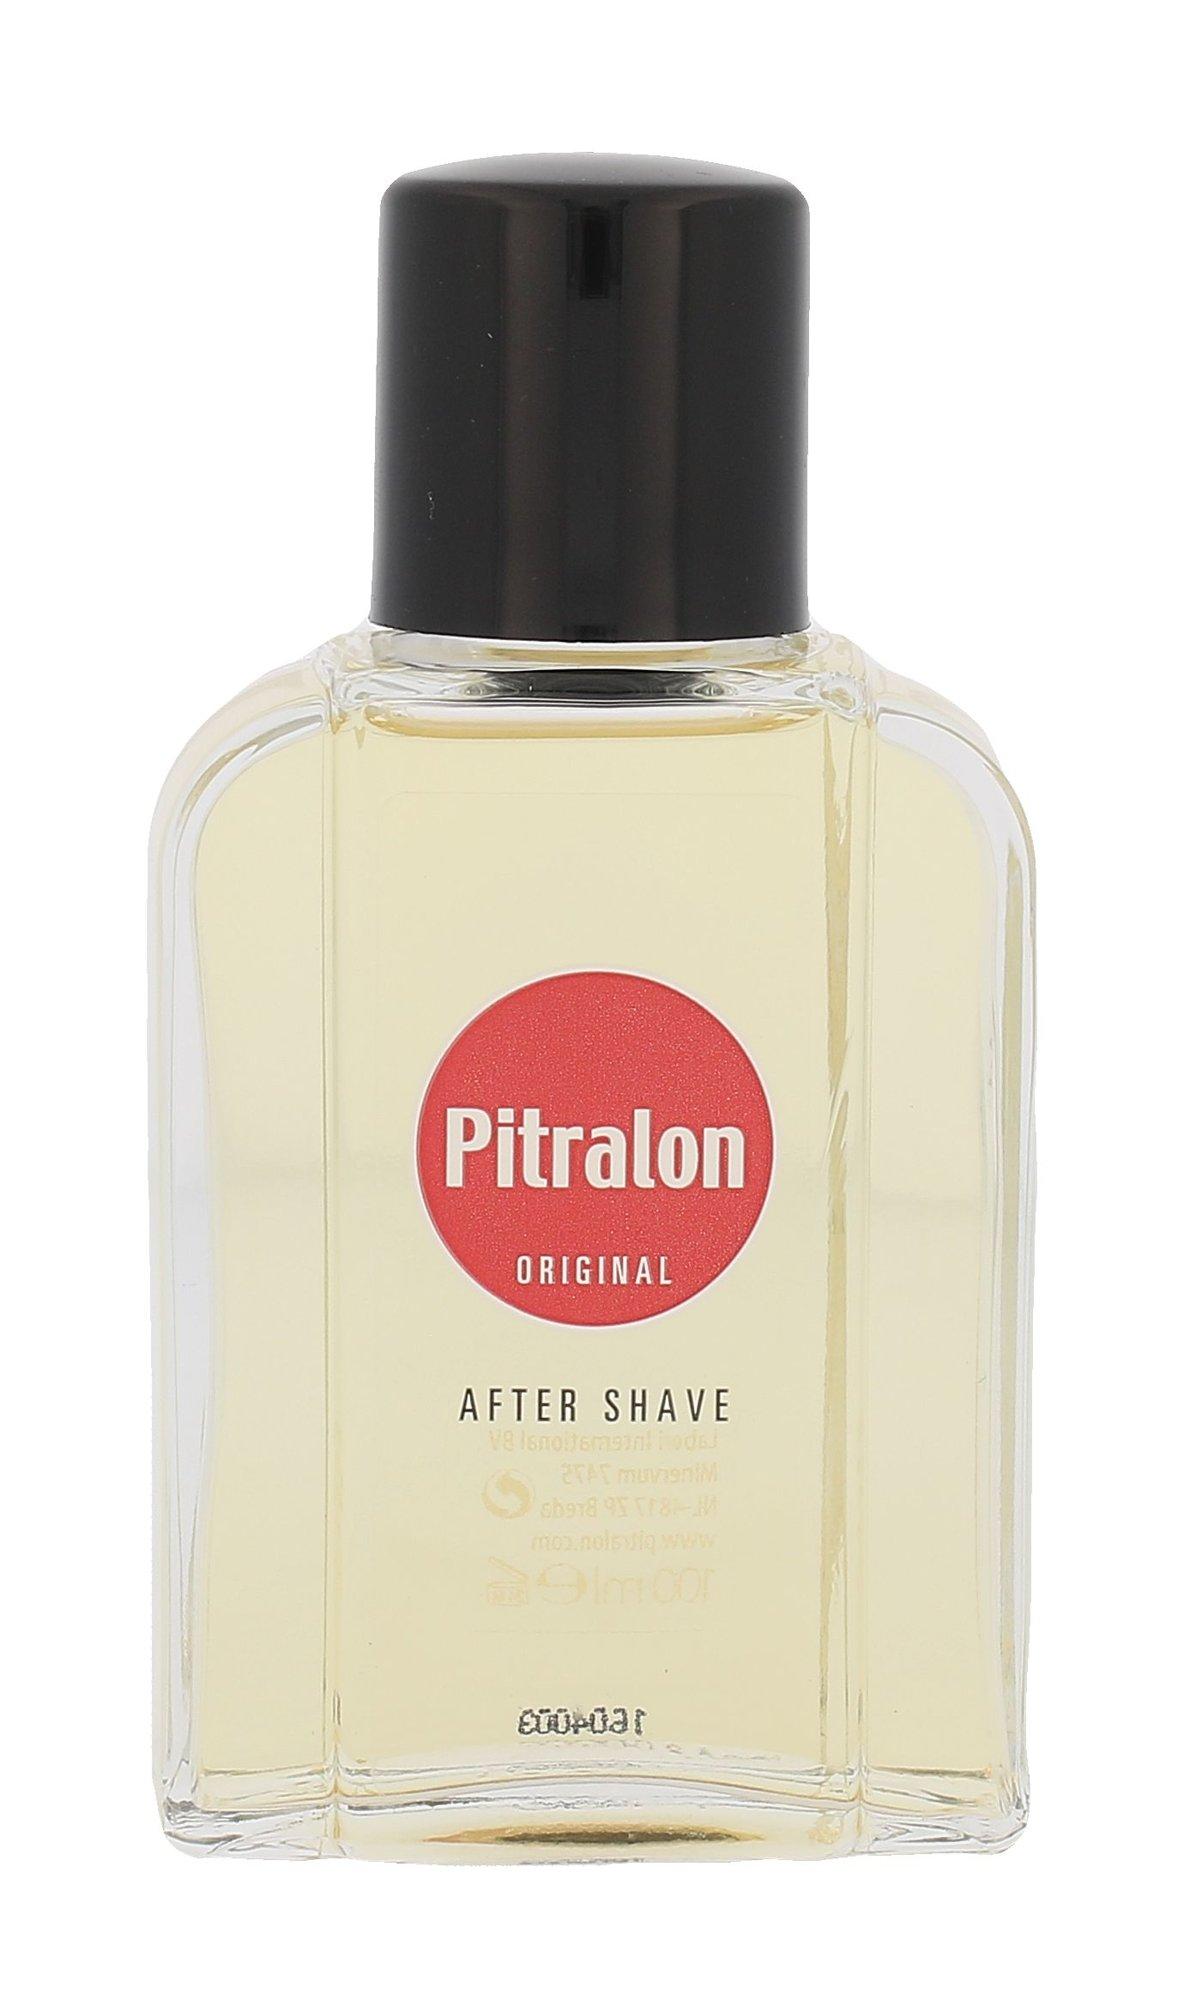 Pitralon Original Aftershave 100ml